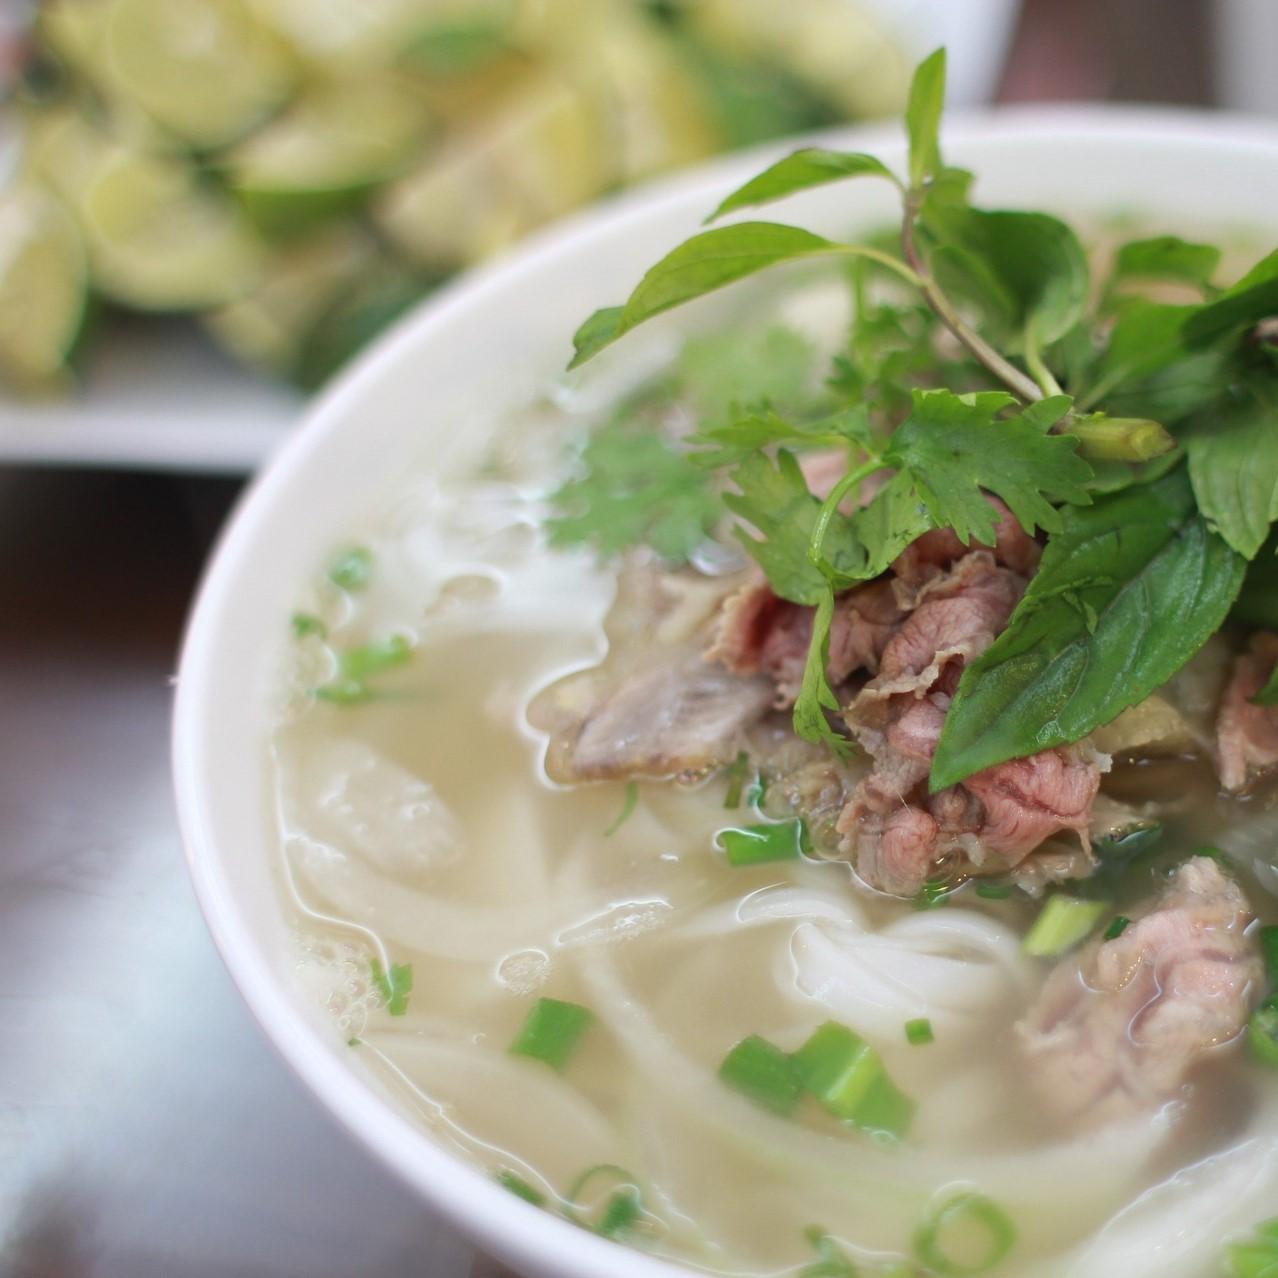 Vietnamese keuken: kip curry en wokgroentemix